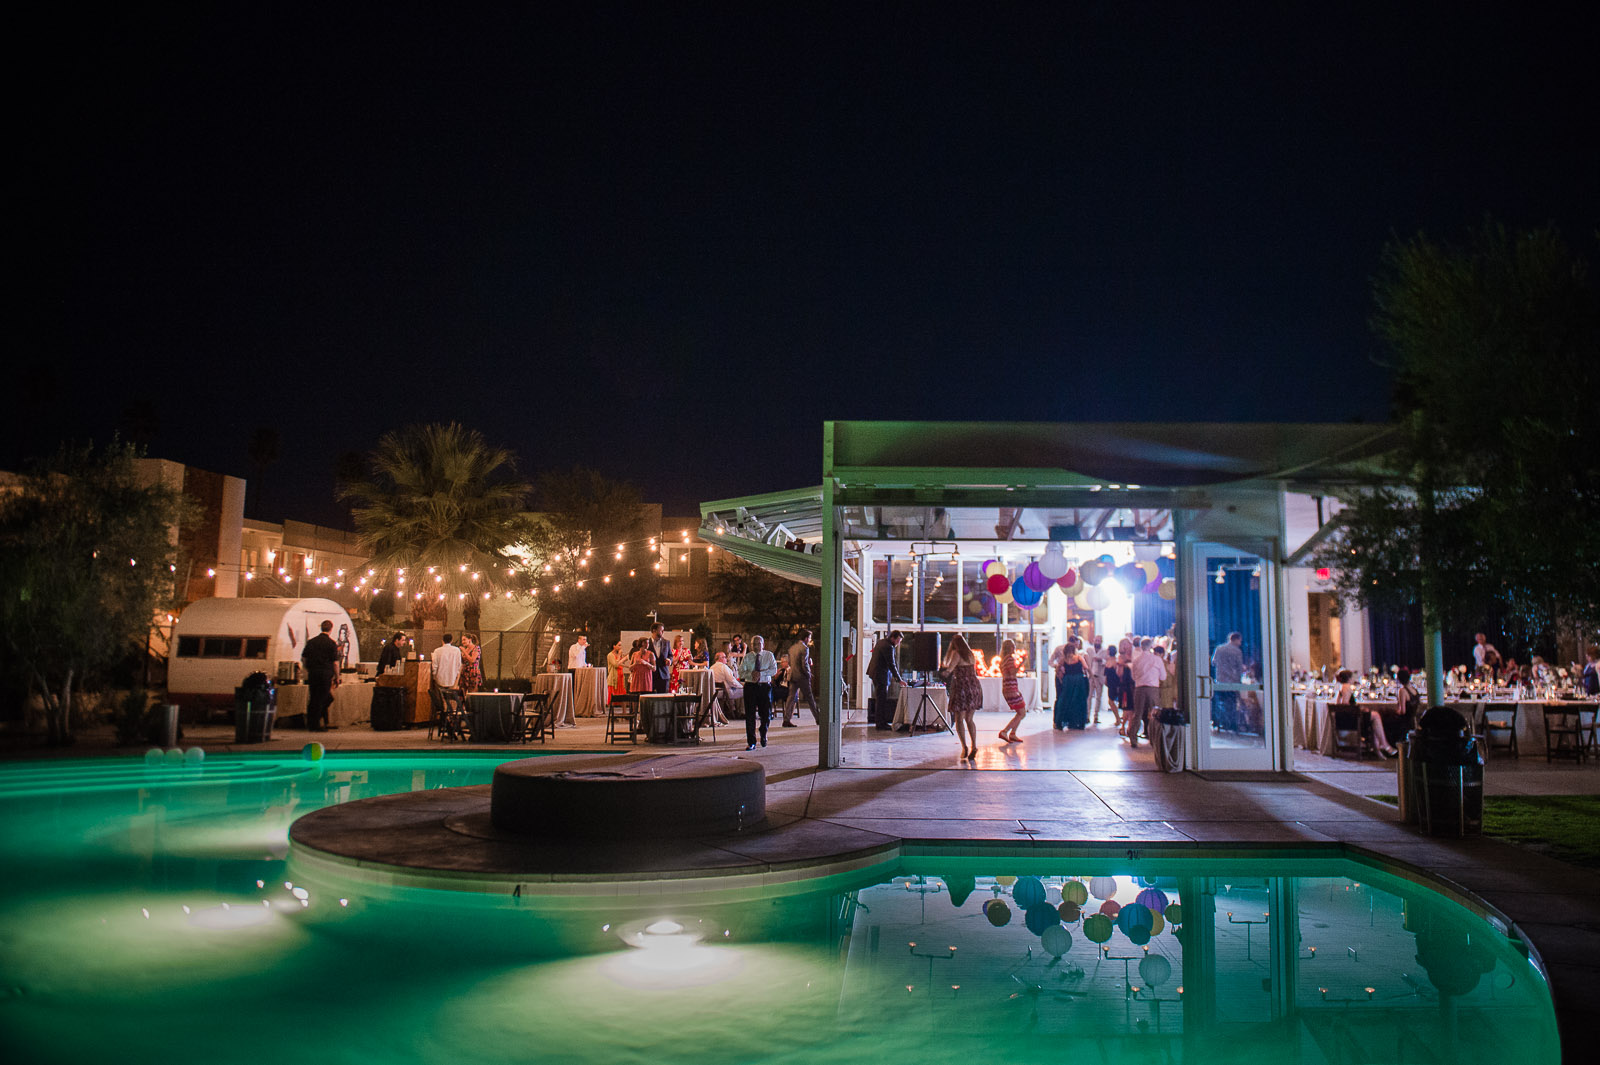 ace-hotel-palm-springs-wedding-65.jpg